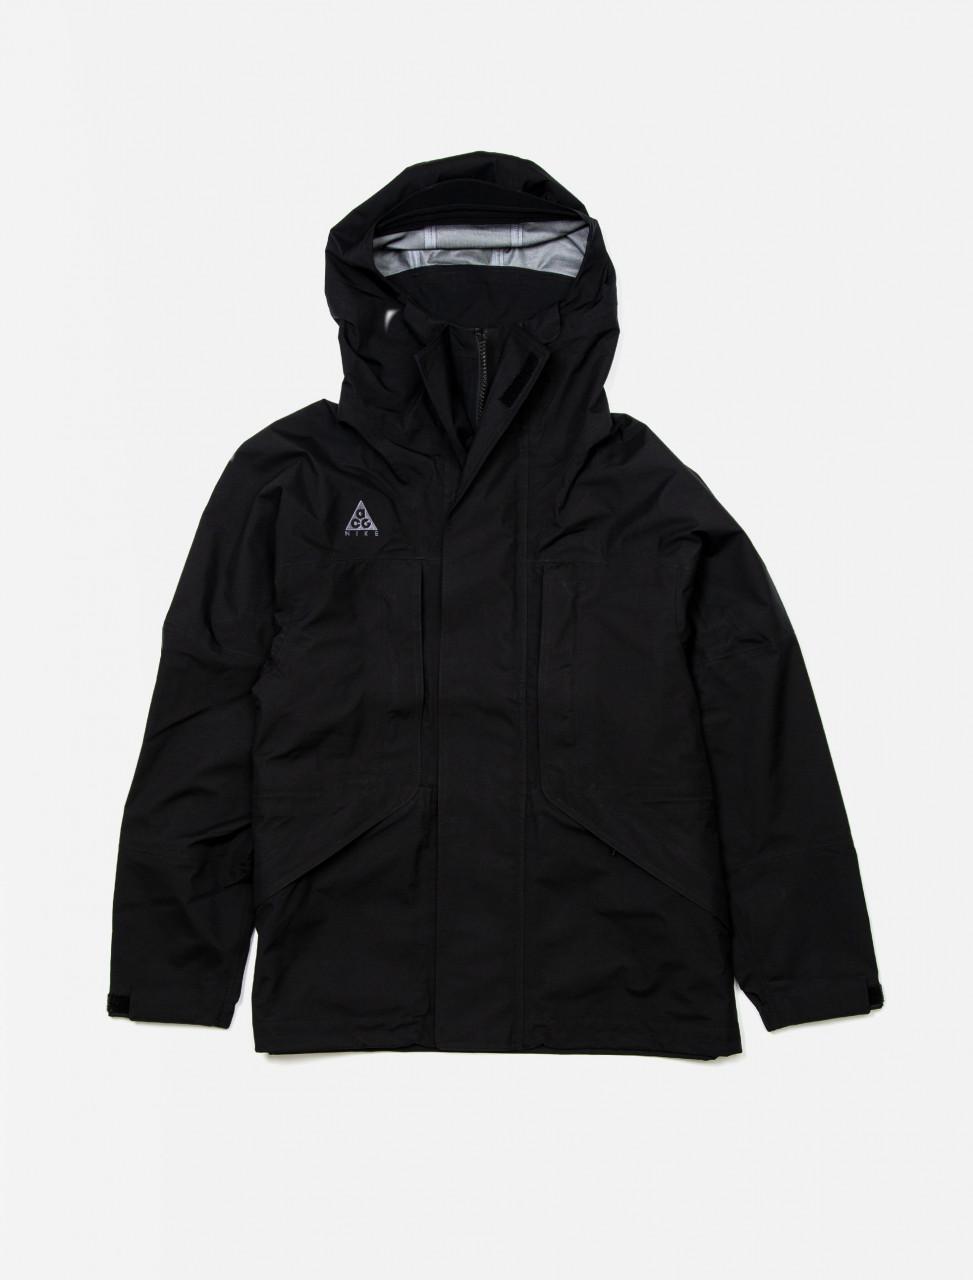 ACG Goretex Jacket